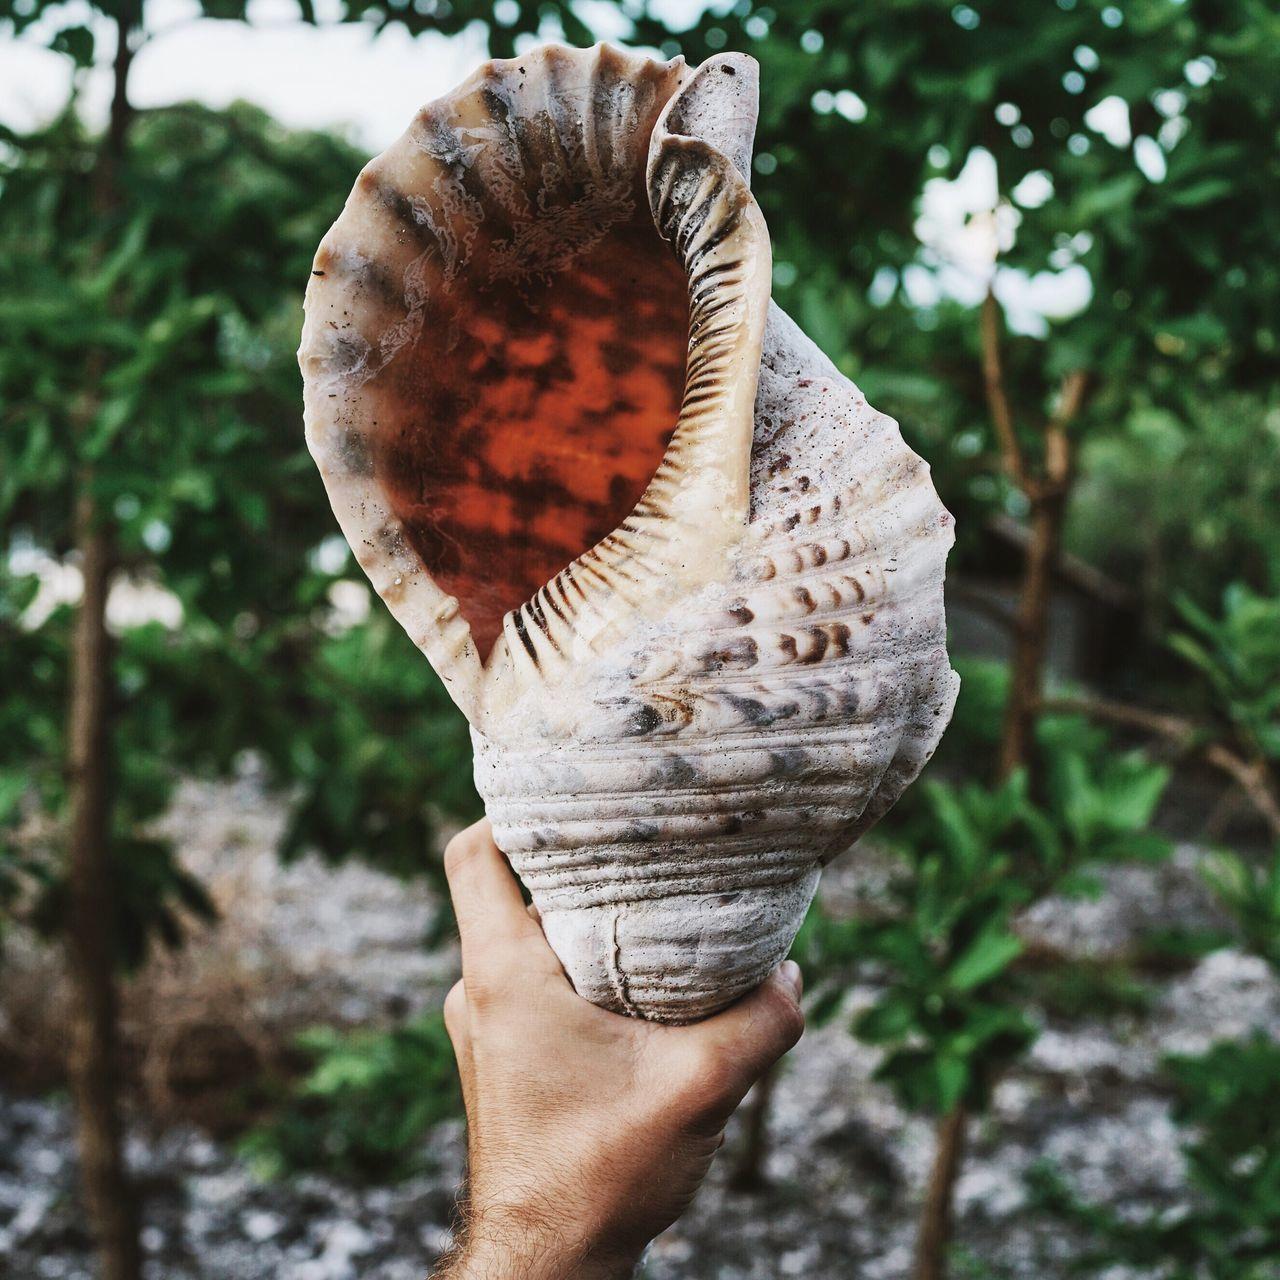 Close-Up Of Hand Holding Seashell